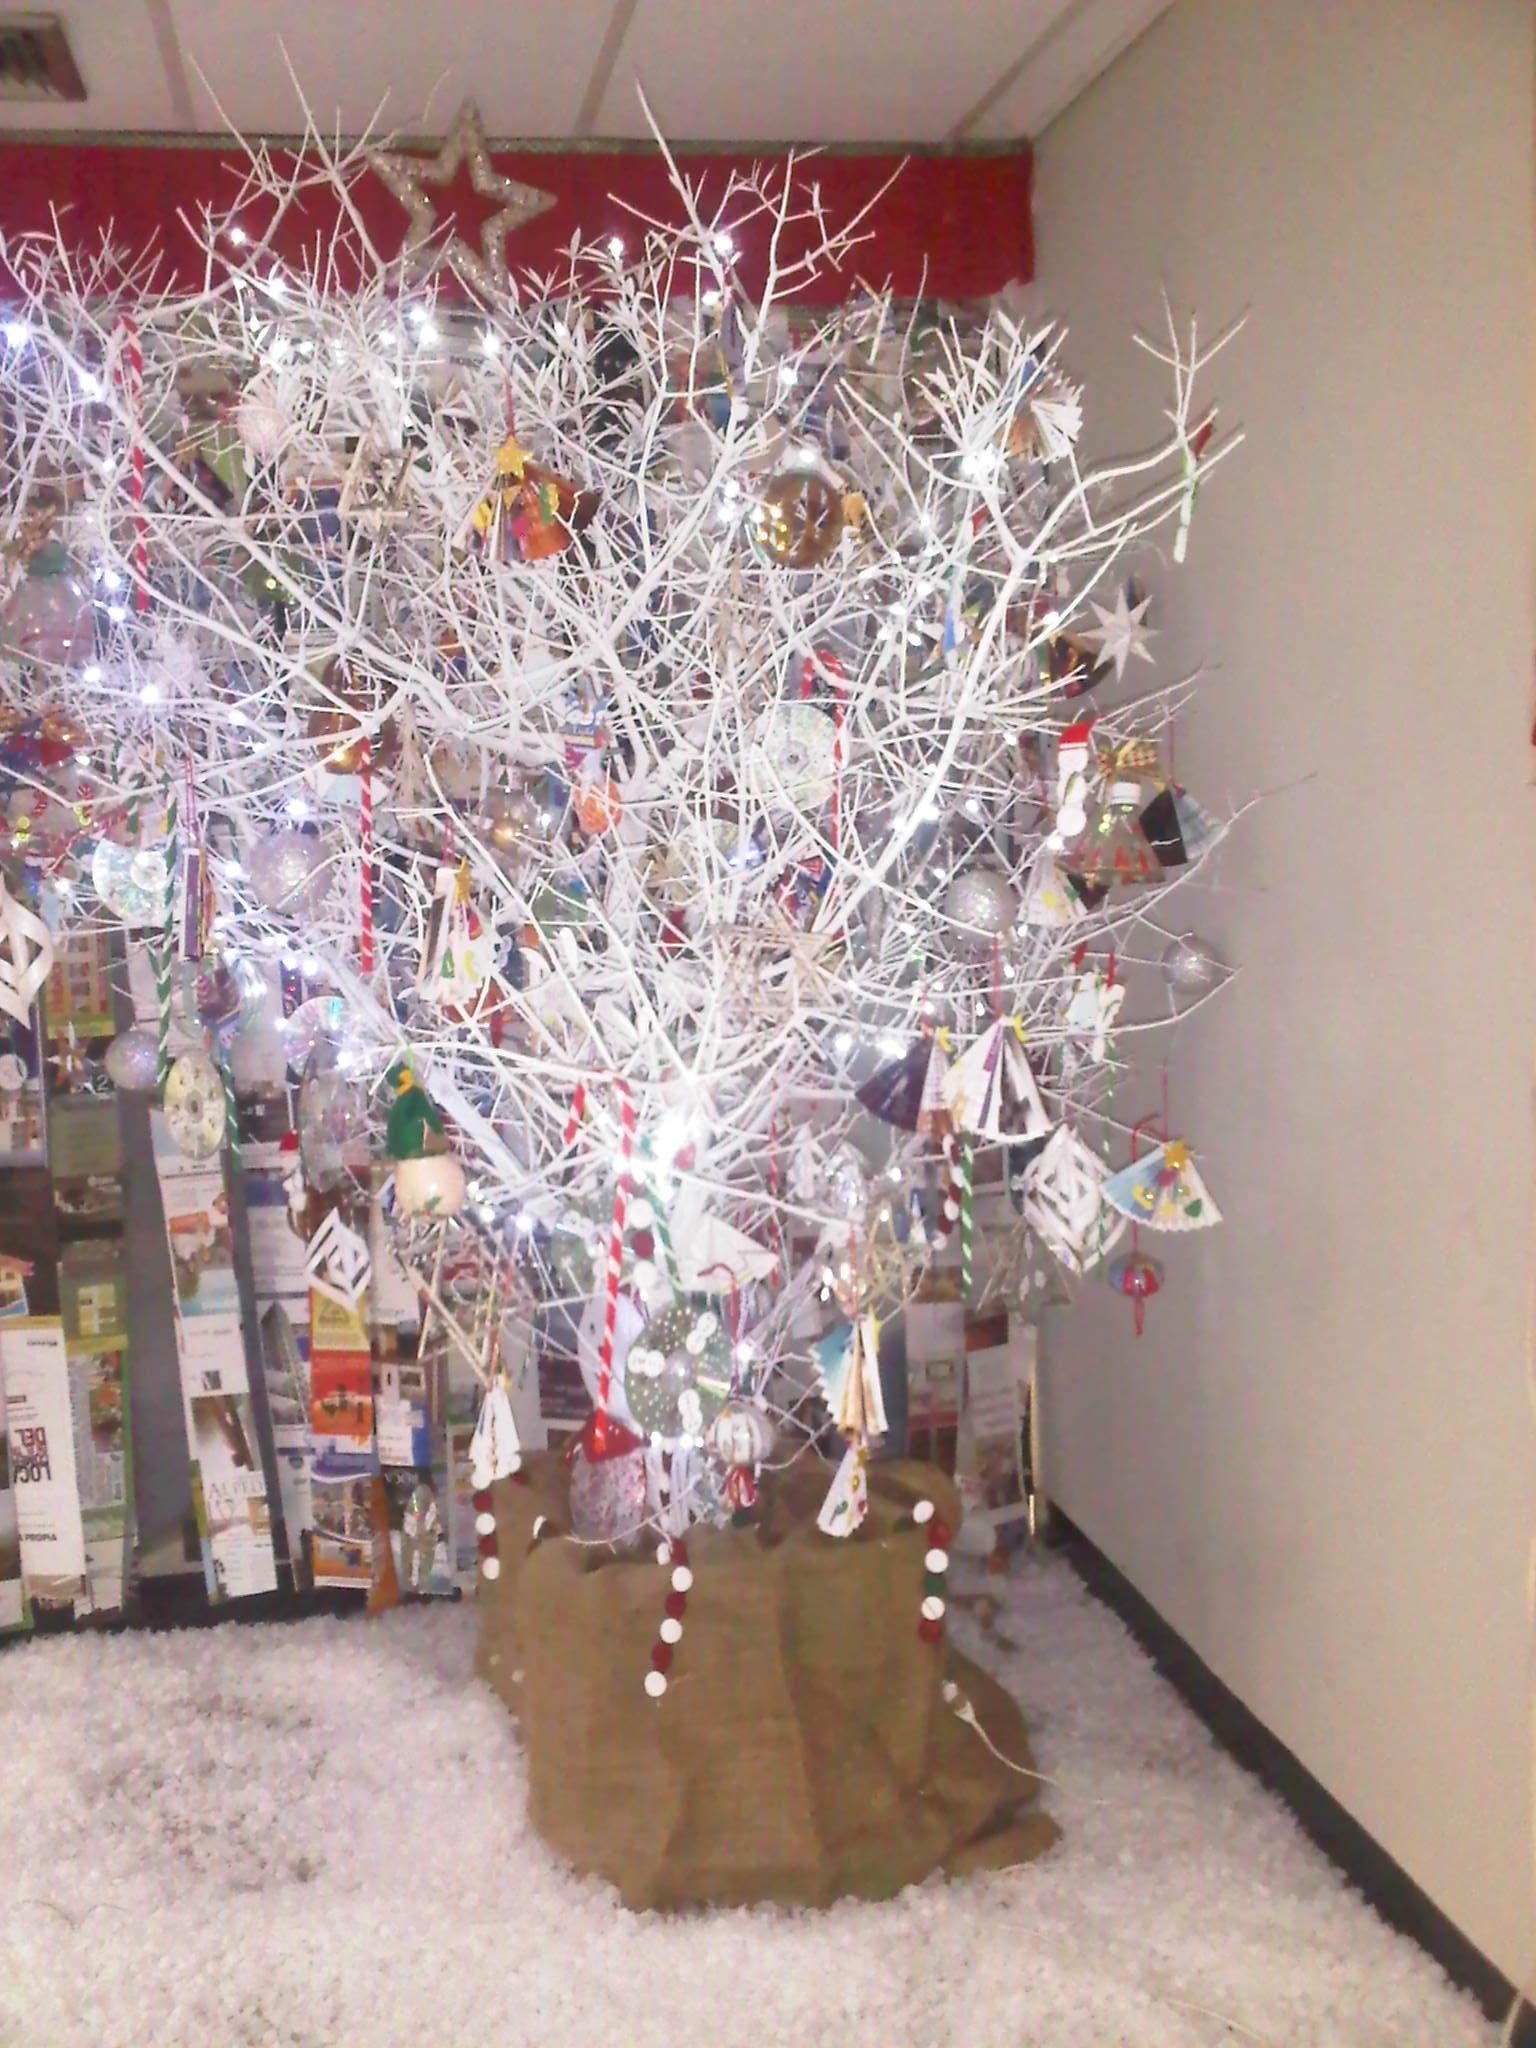 Arbol navideño de ramas secas   Christmas   Pinterest   Rama seca ...